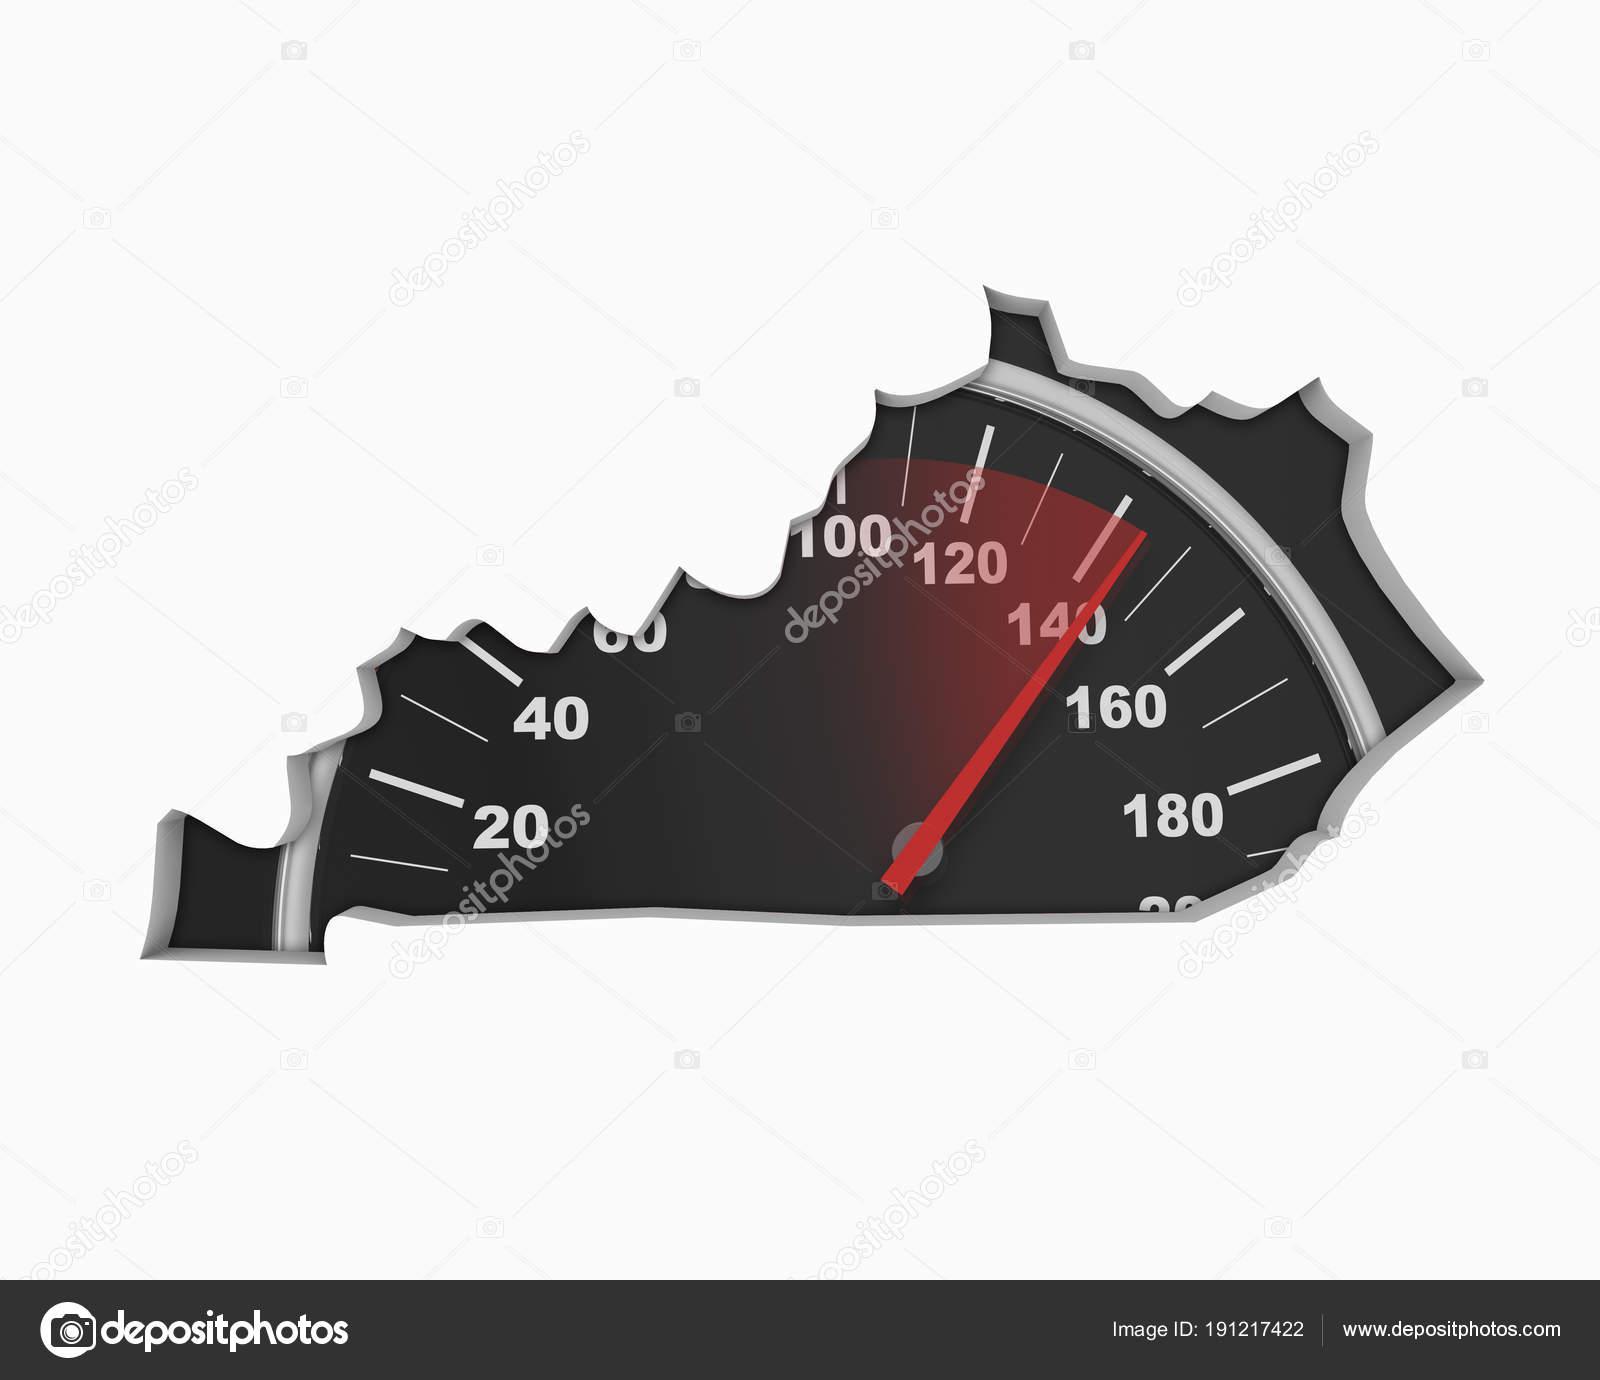 Kentucky Road Map Pflaster Bau Infrastruktur Illustration ...